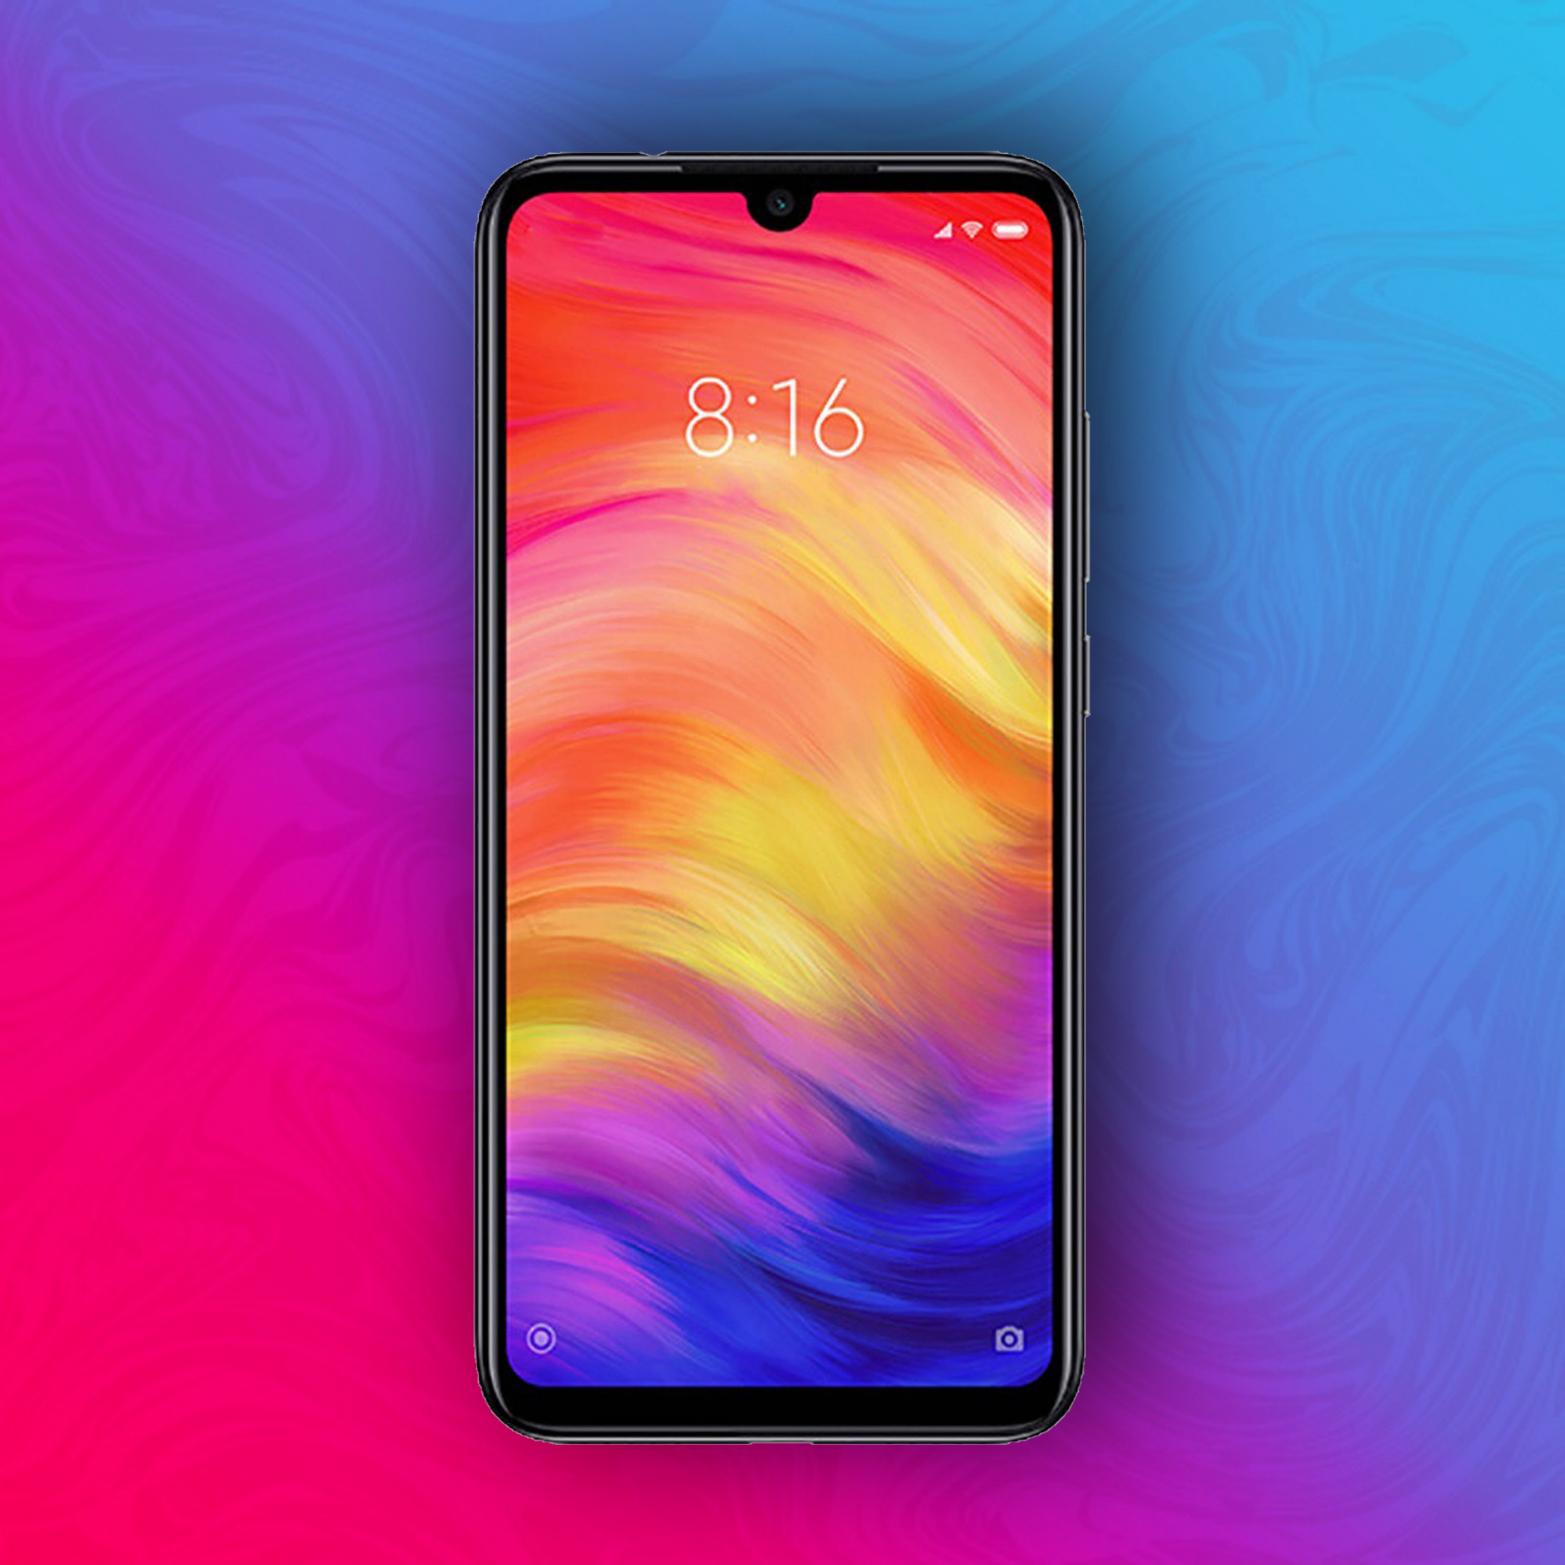 Xiaomi Redmi Note 7 32/3GB - Snapdragon 660 - 48MP/5MP Kamera - 4000mAh Akku | Deutscher Händler